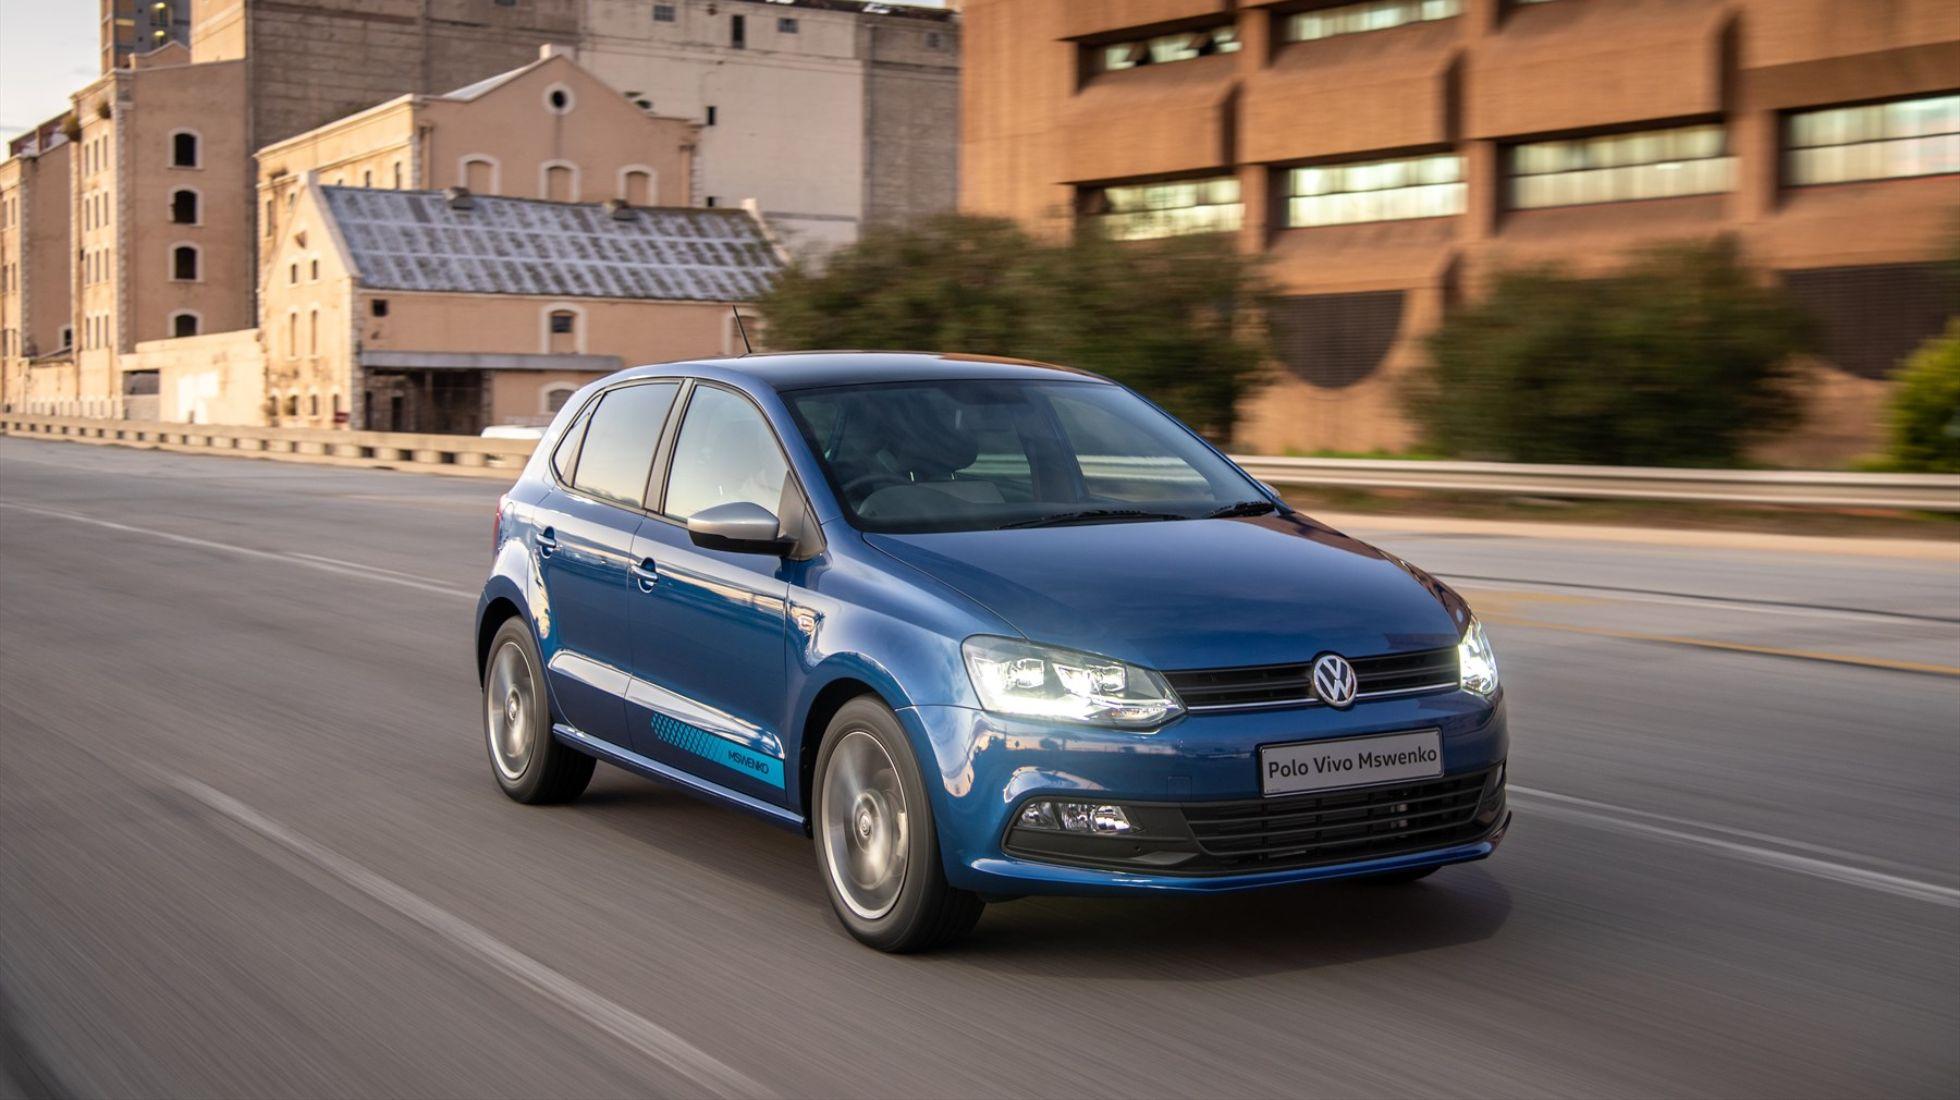 Volkswagen Polo Vivo Mswenko